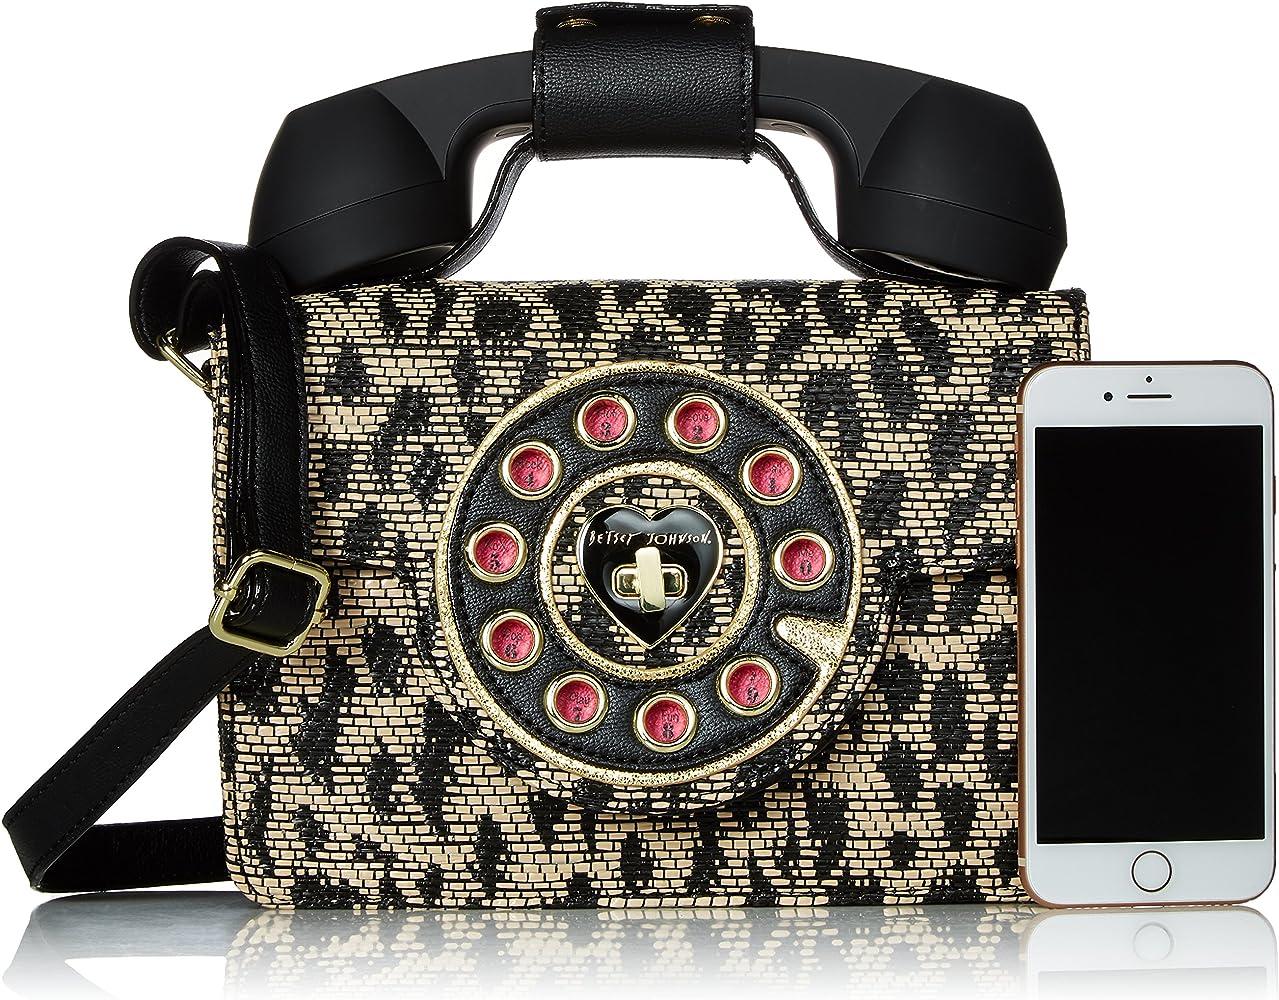 75fd9e02de42 Betsey Johnson Mighty Jungle Leopard Print Phone Bag: Handbags ...